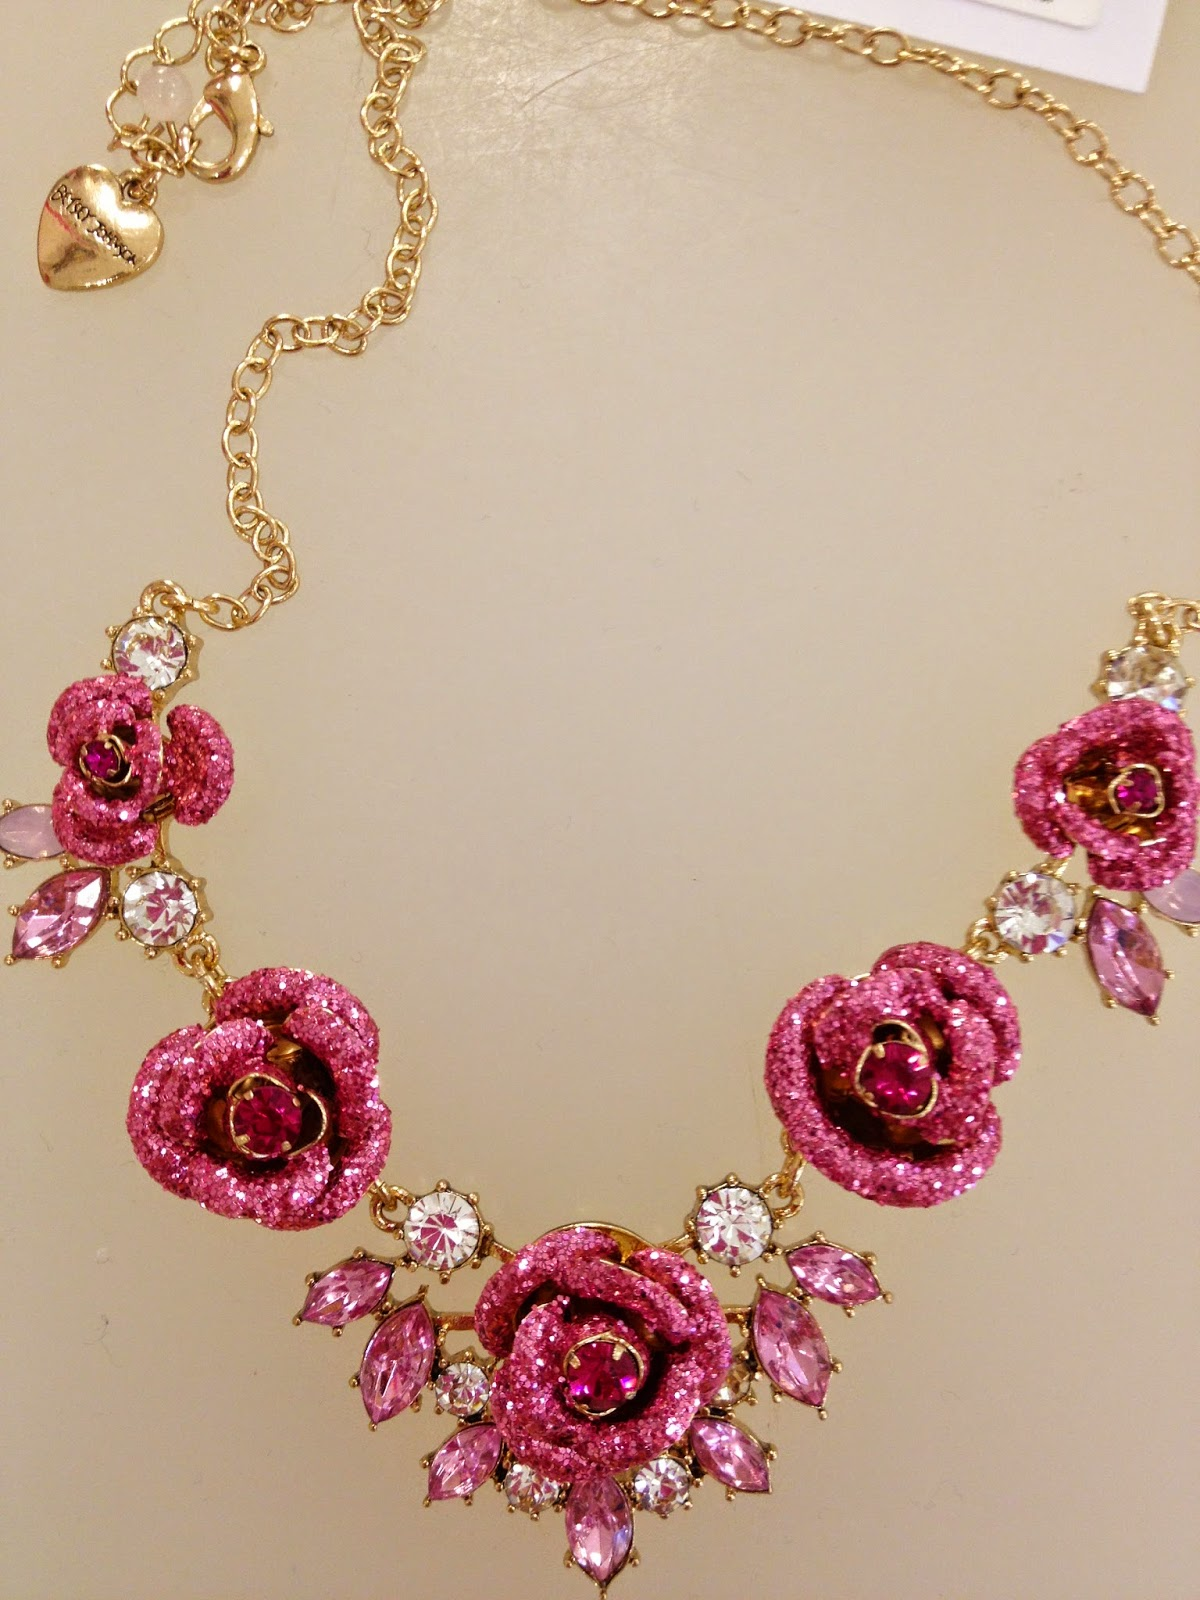 Betsey Johnson Jewelry 2014 | Dress images